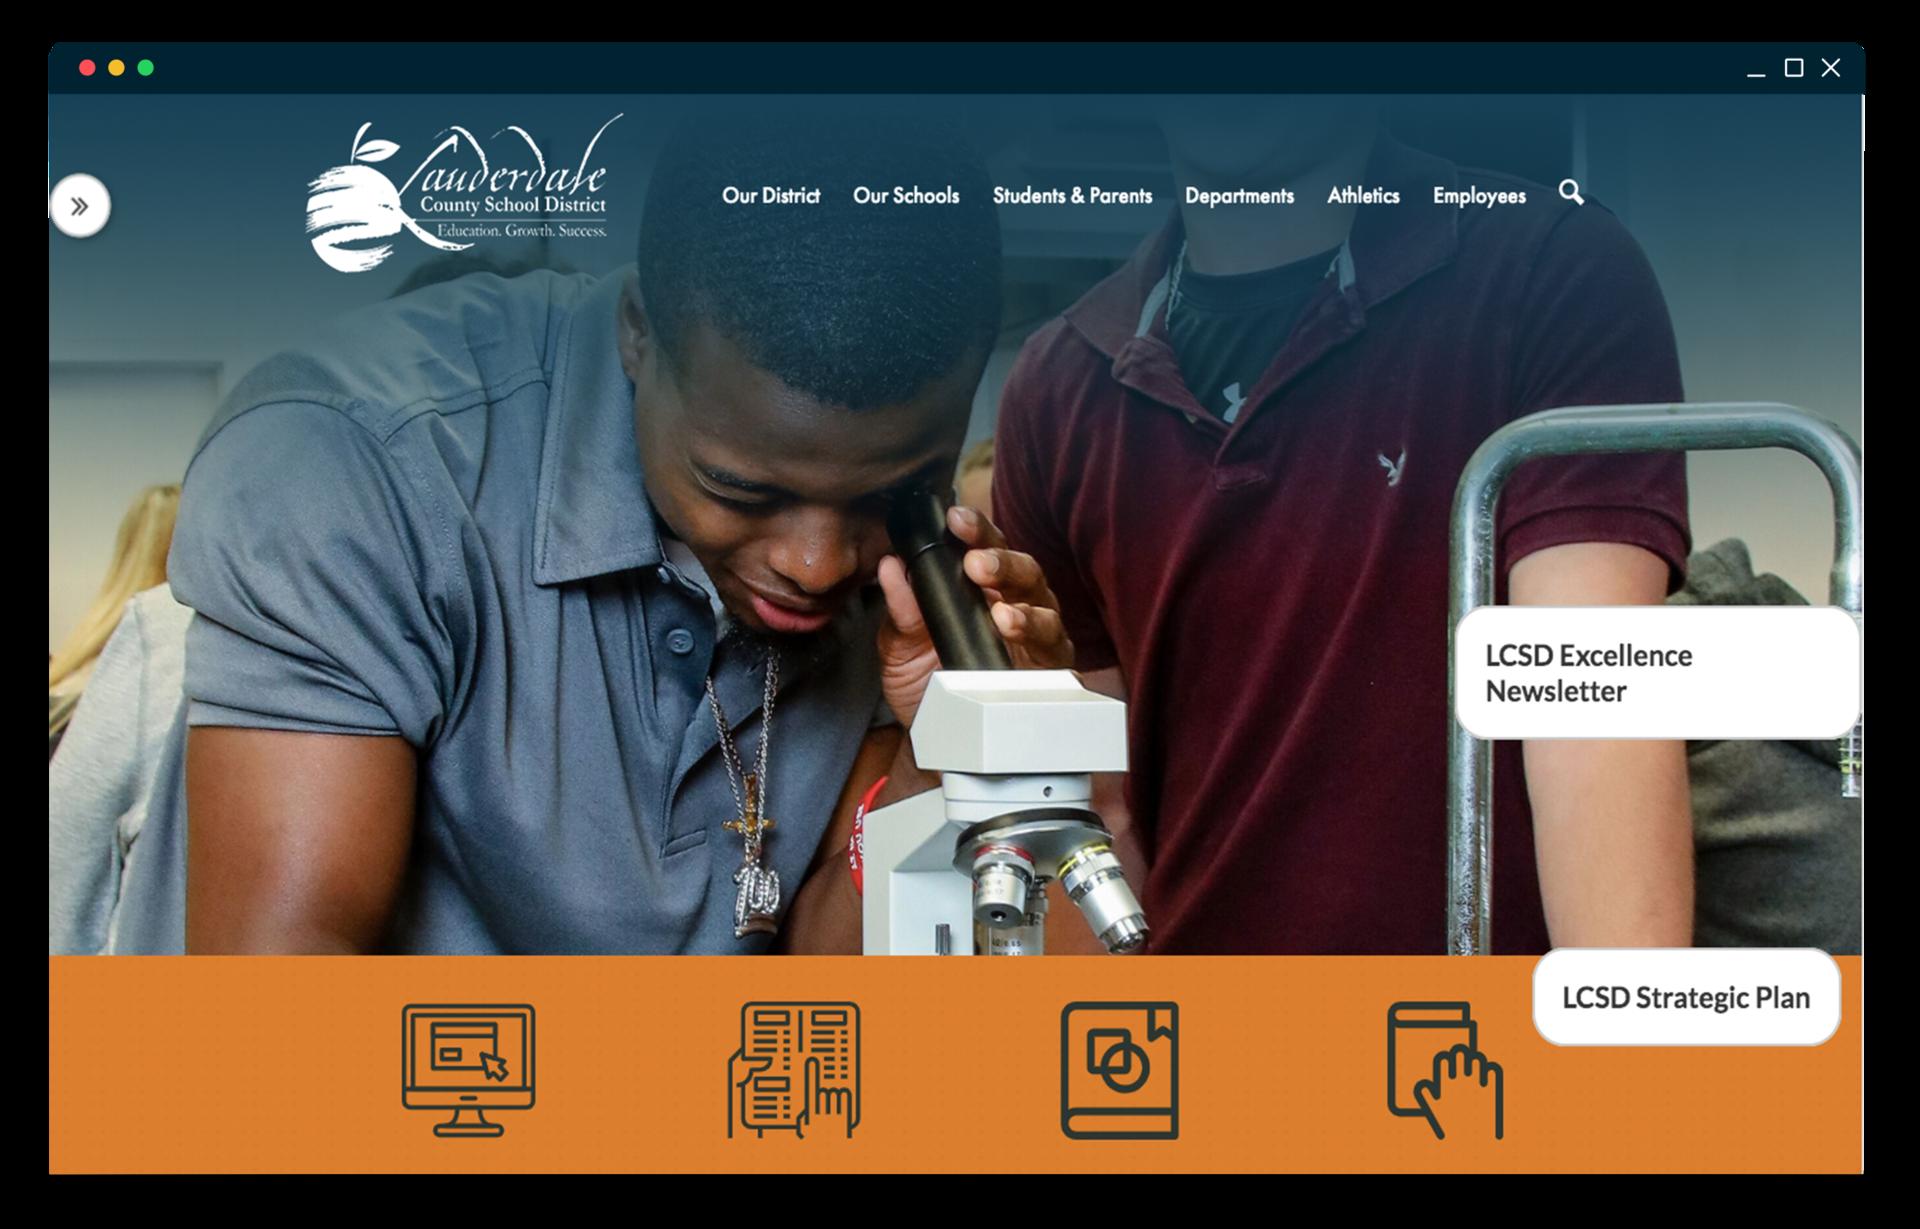 Lauderdale County School District new website homepage